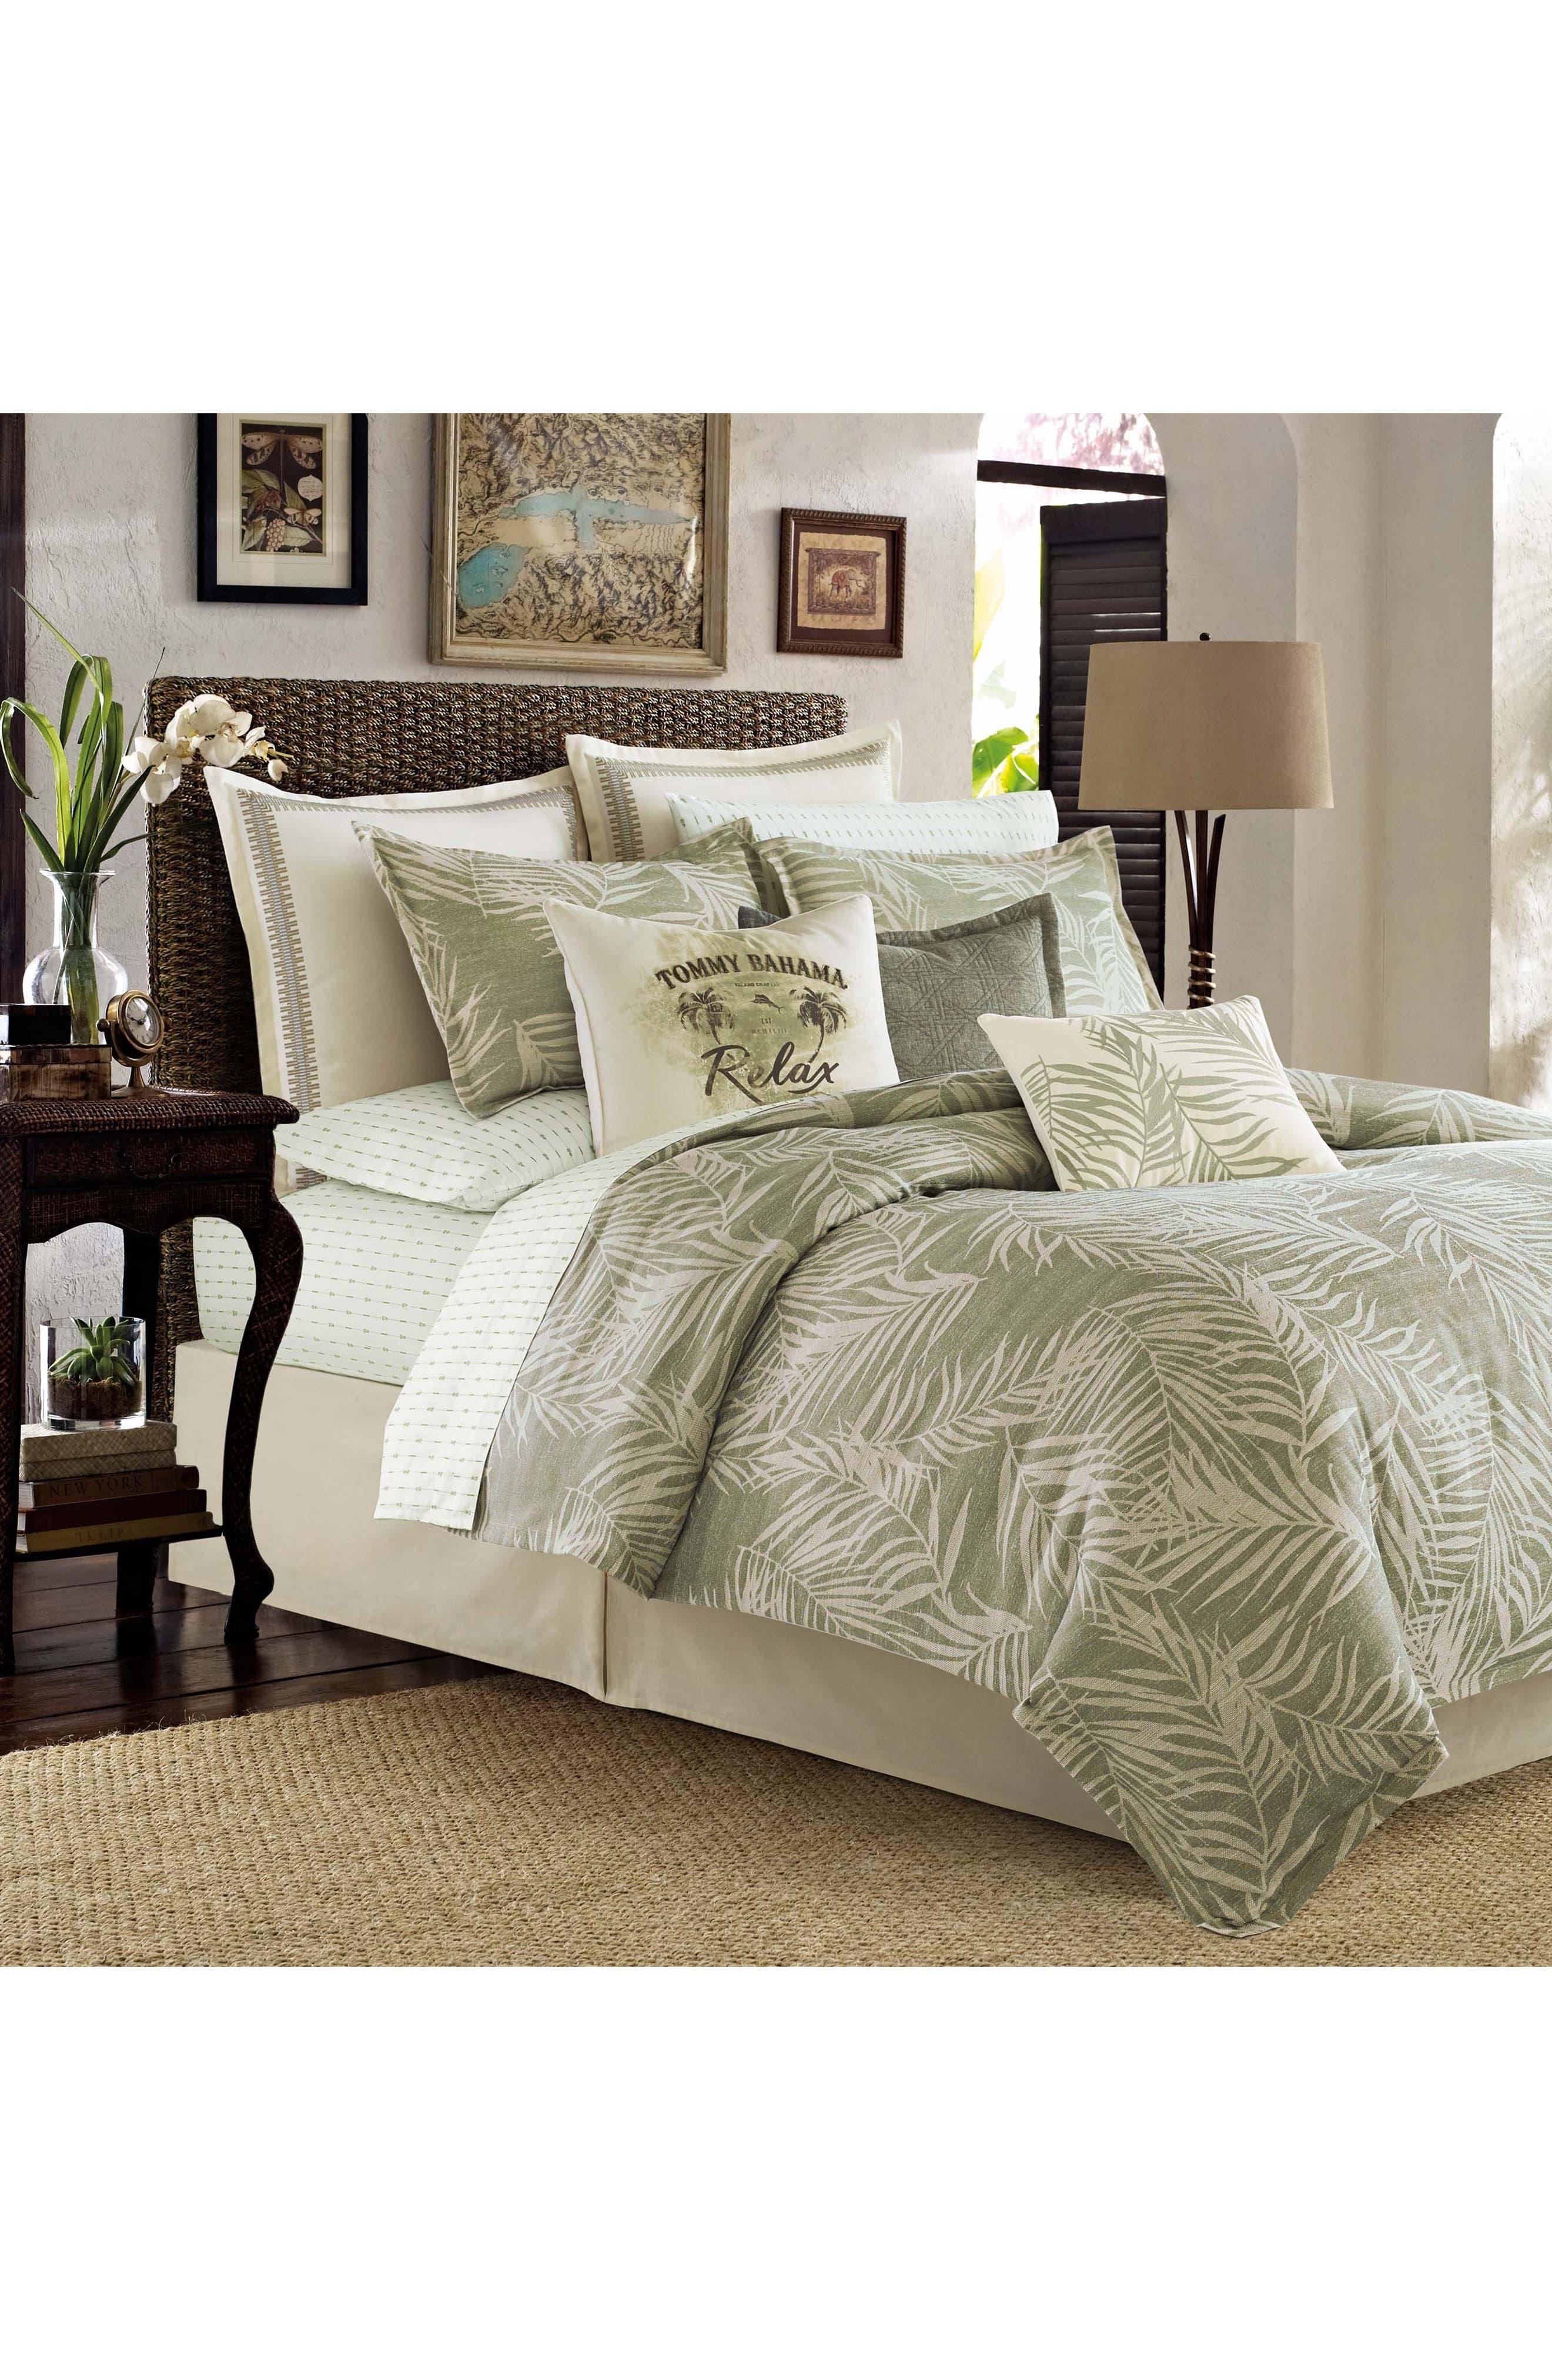 Palms Away Comforter, Sham & Bed Skirt Set,                             Main thumbnail 1, color,                             300